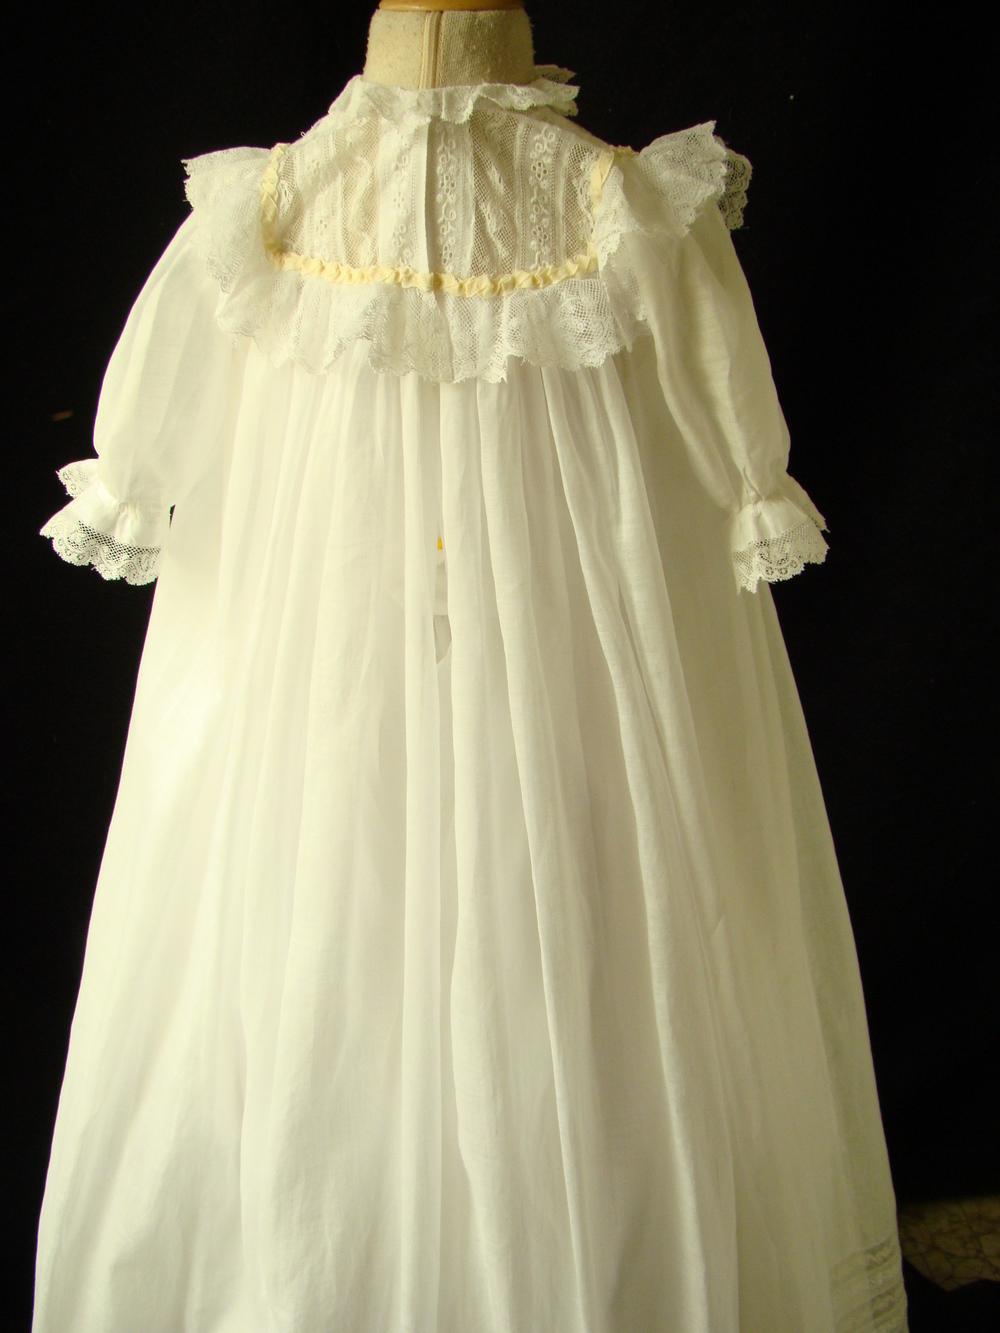 gowns3 052.JPG